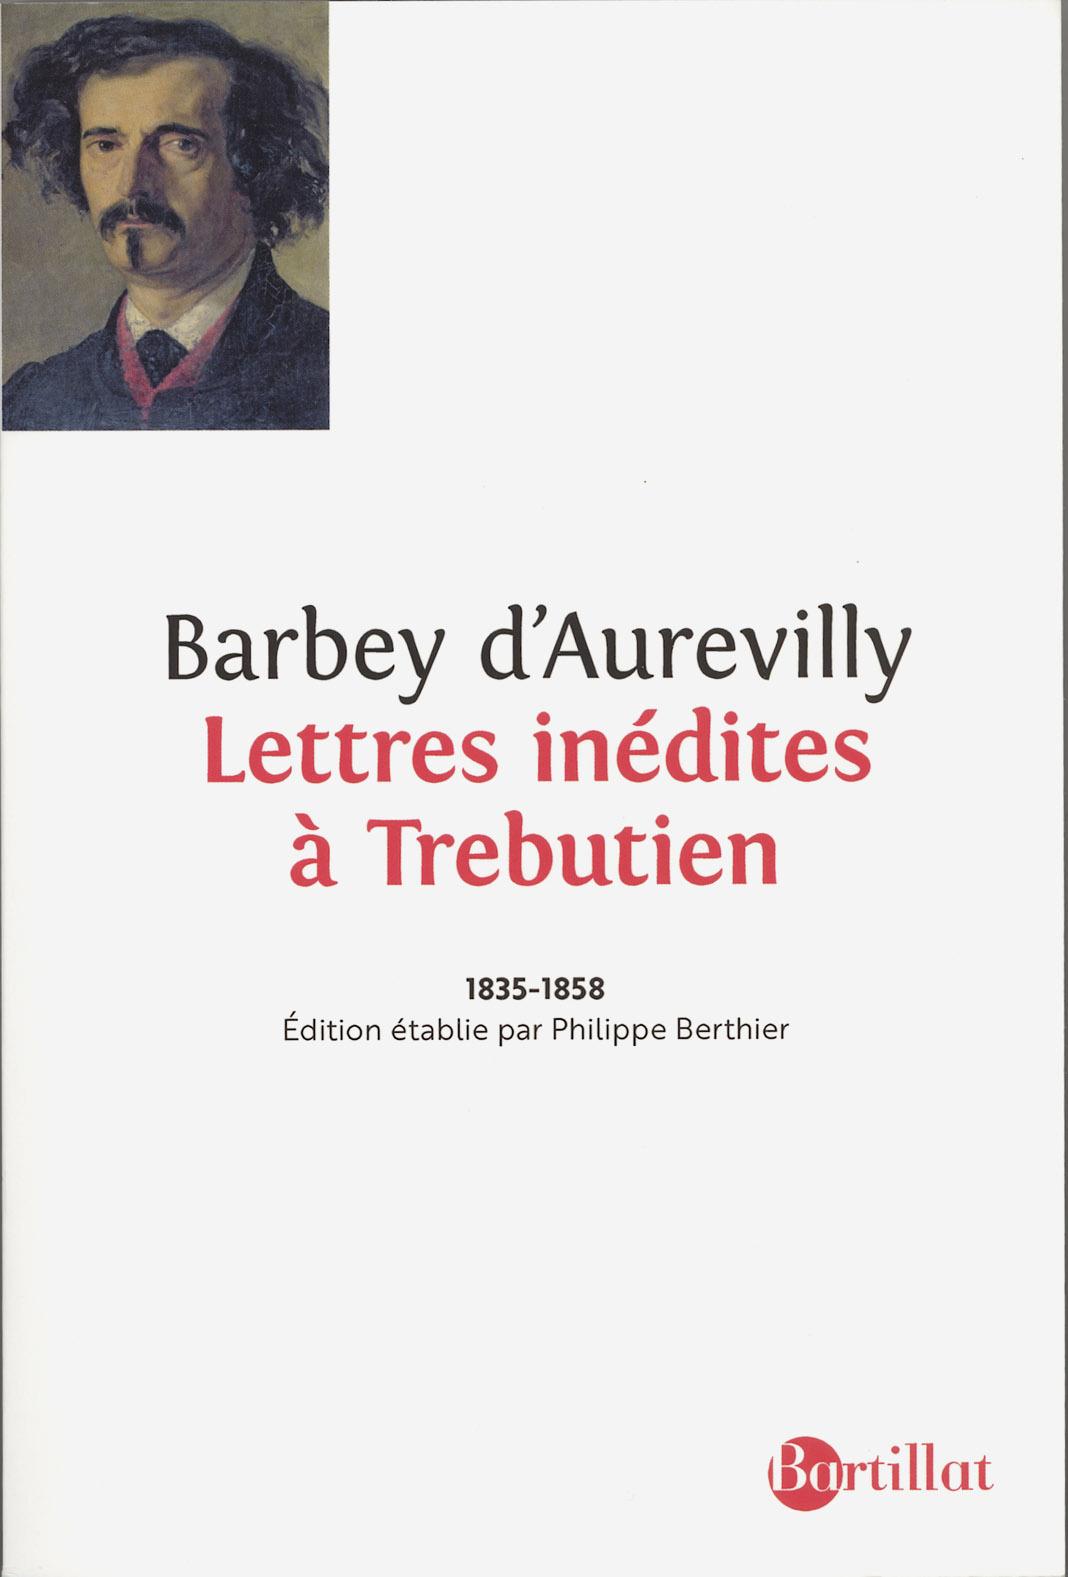 Barbey